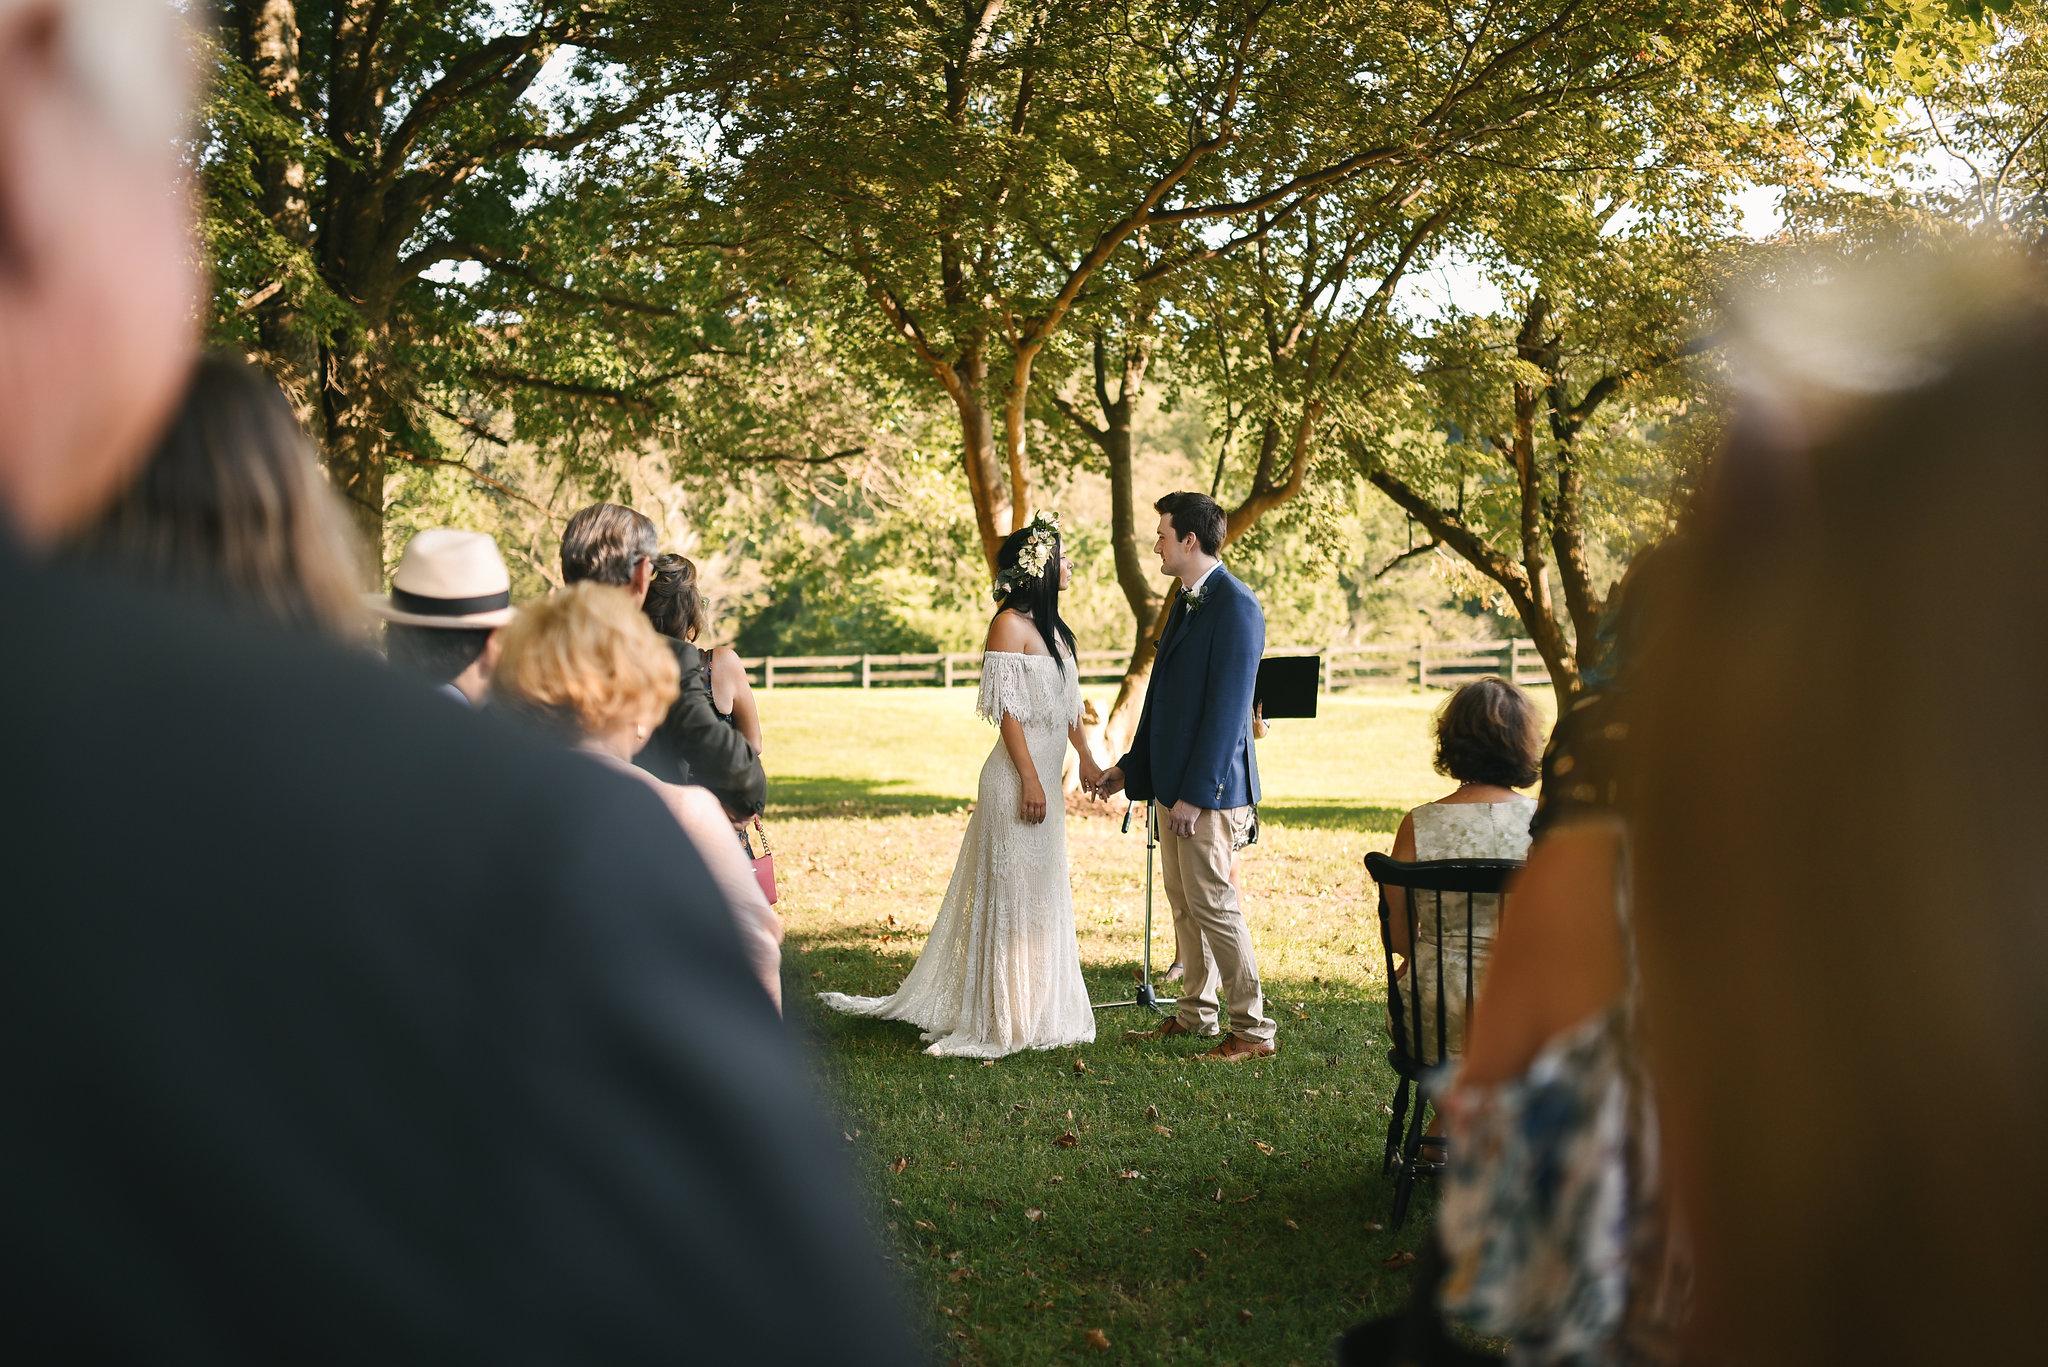 Maryland, Eastern Shore, Baltimore Wedding Photographer, Romantic, Boho, Backyard Wedding, Nature, Bride and Groom Holding Hands at Ceremony, Daughters of Simone Wedding Dress